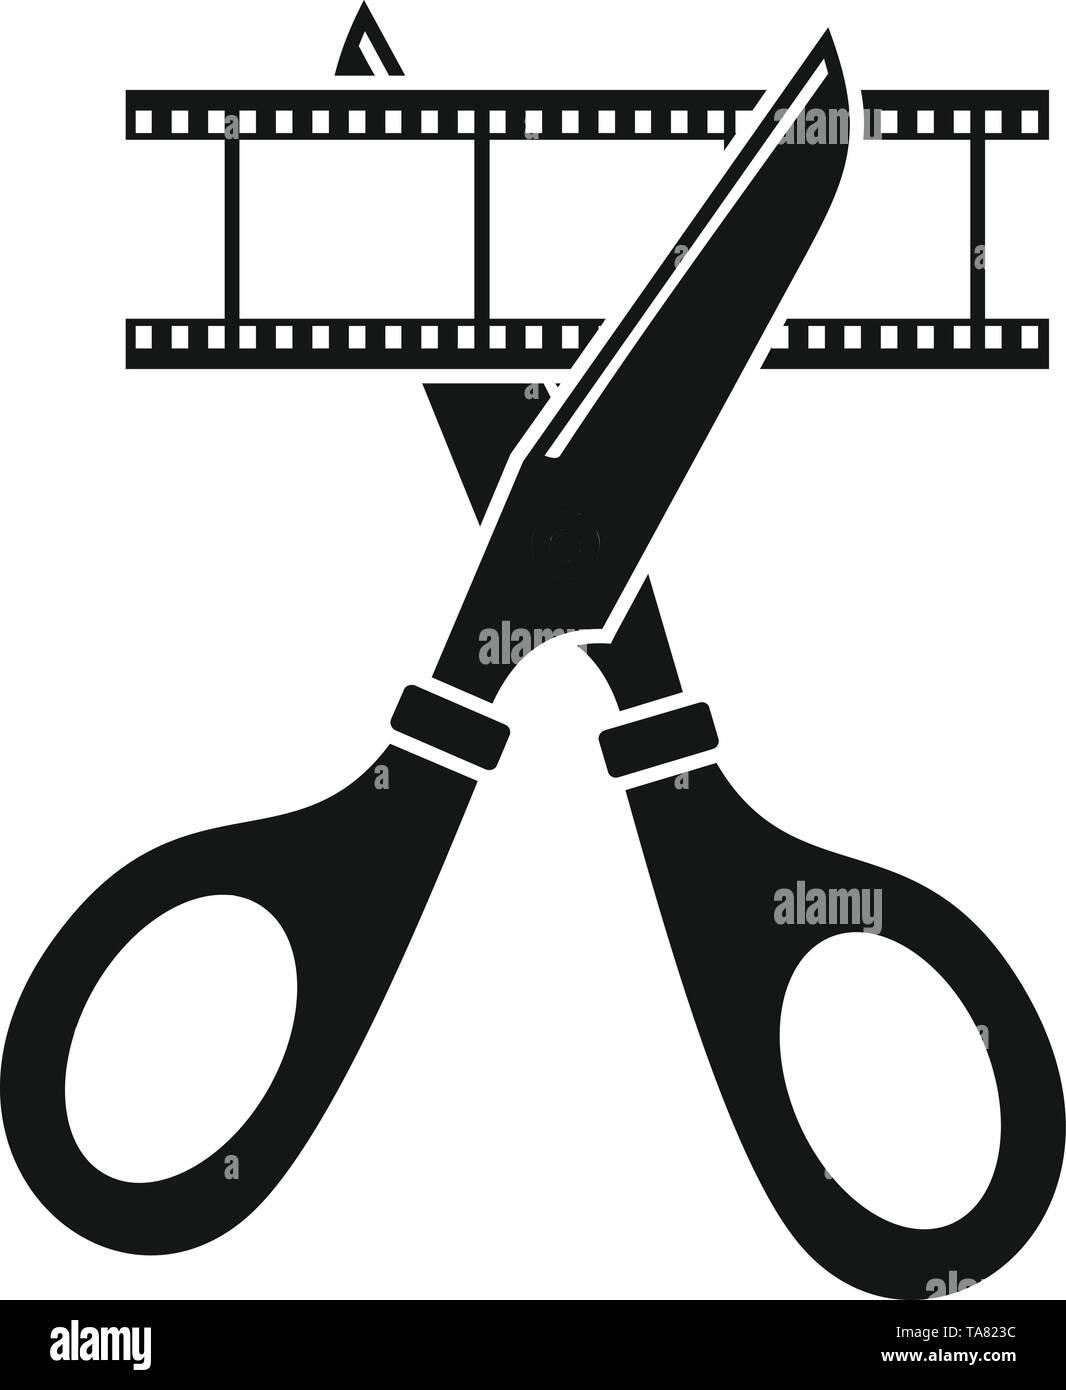 Scissors cut film icon. Simple illustration of scissors cut film vector icon for web design isolated on white background - Stock Image